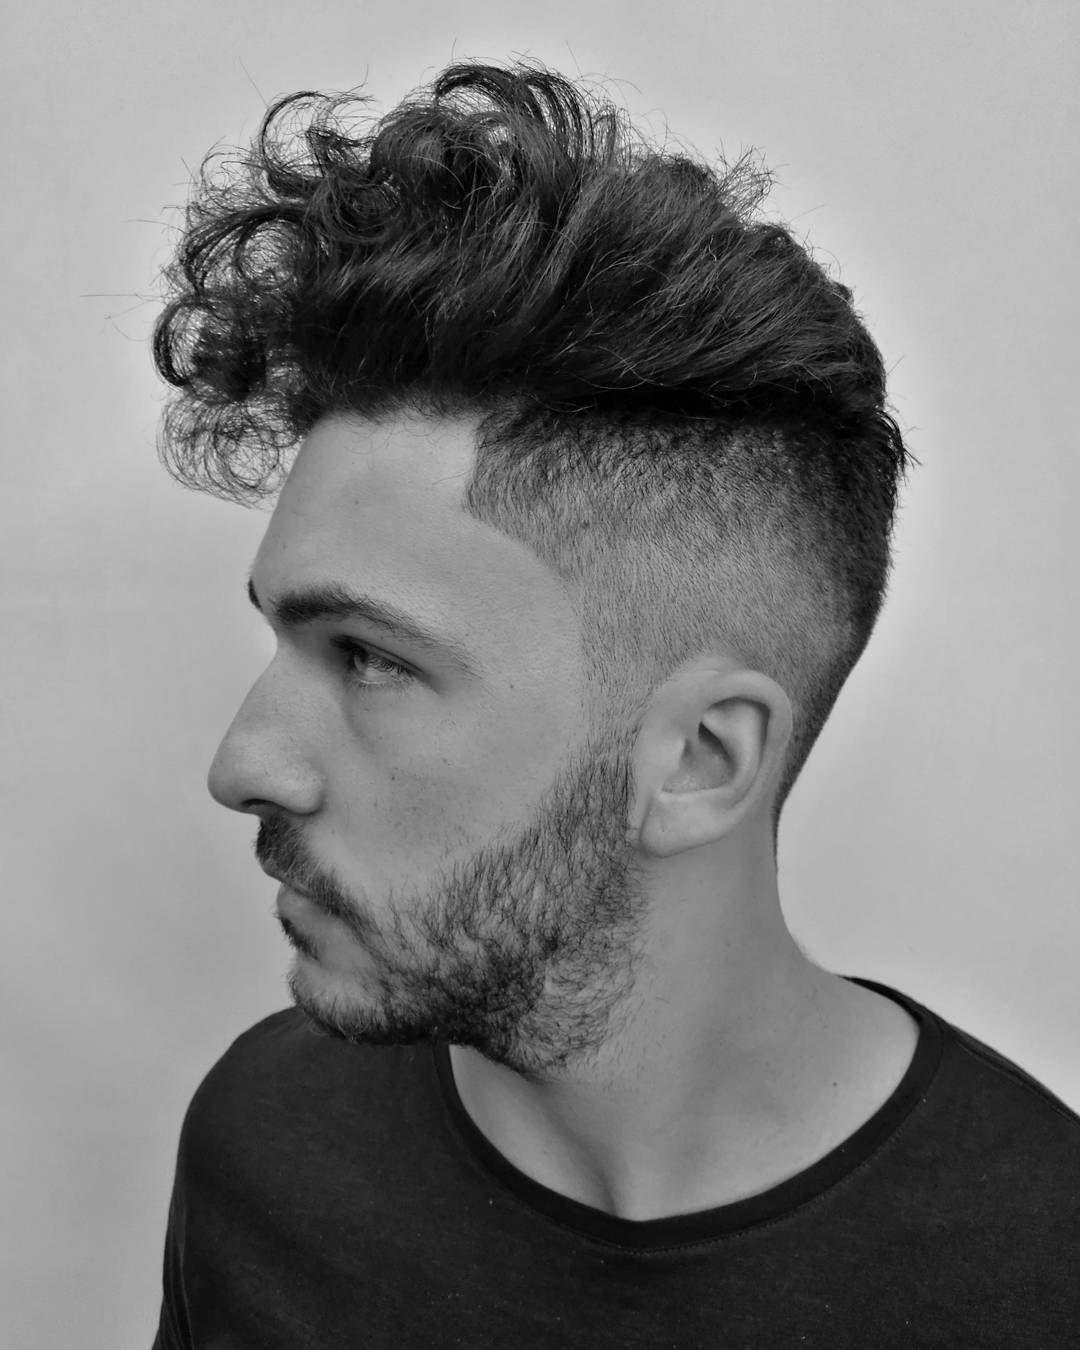 Curly mens haircuts wemarriedhair long curly mens hairstyle menshairstyles  mens